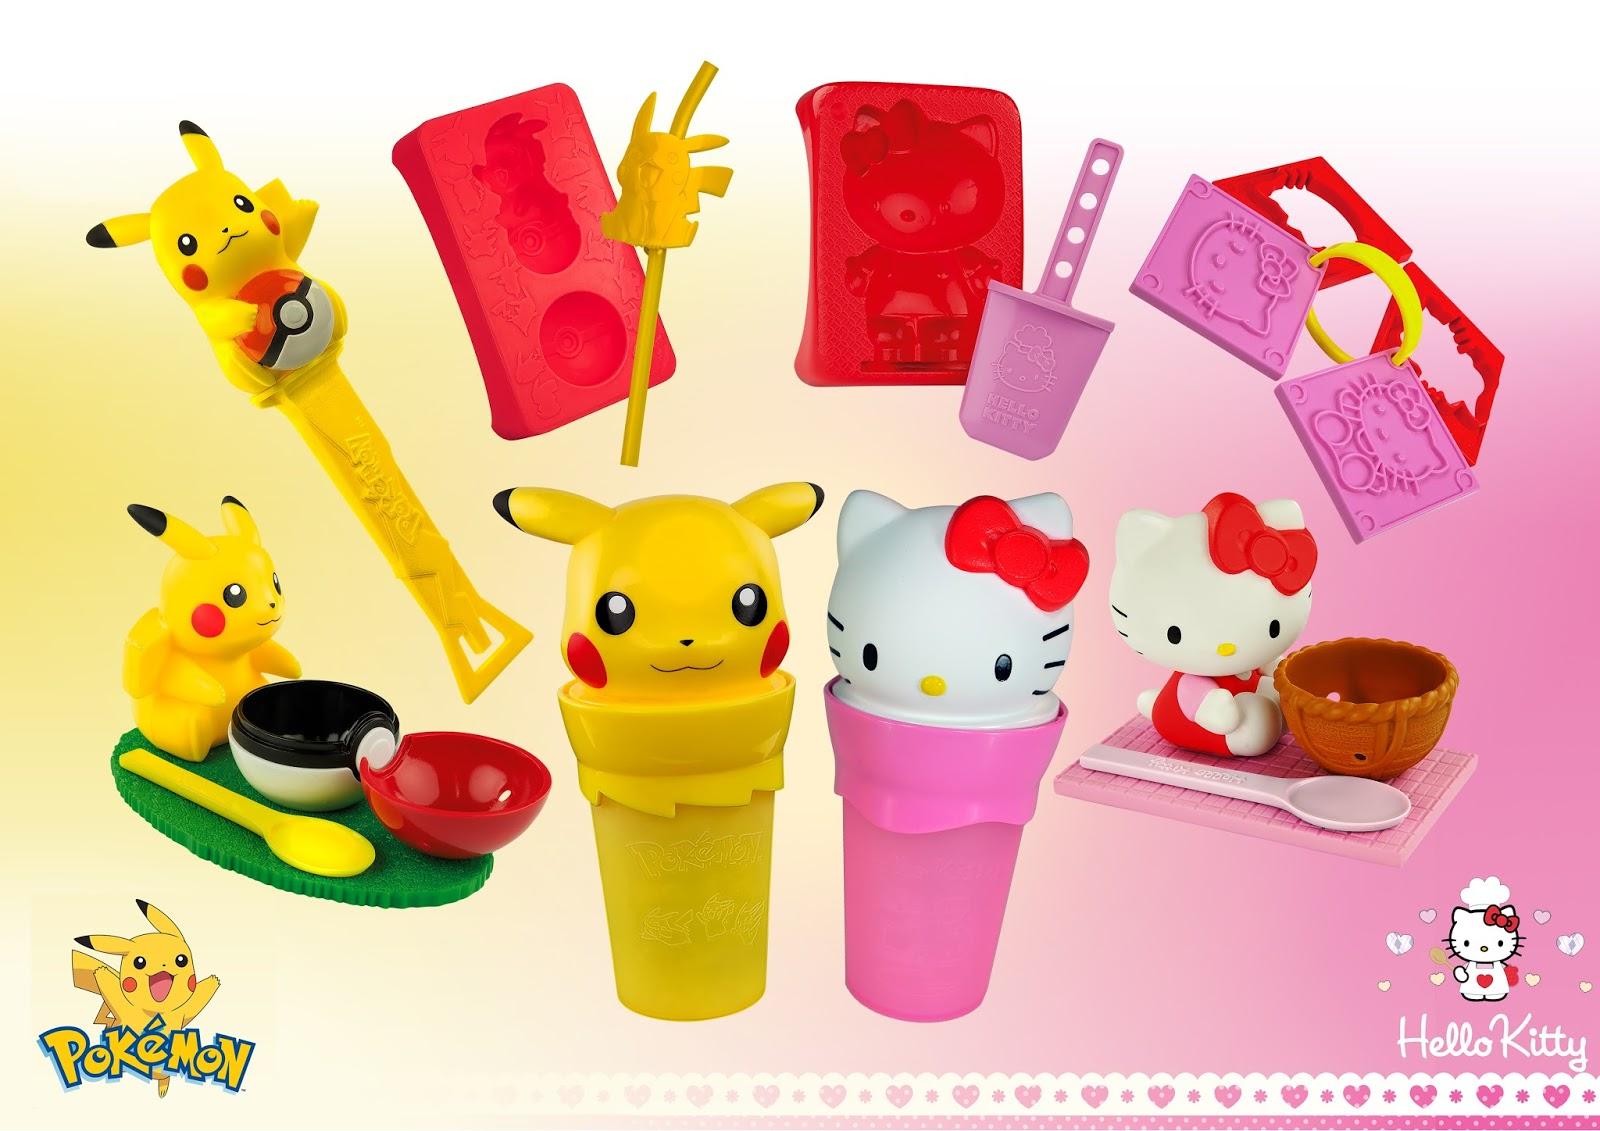 Hello Kitty Mcdonald S Toys : Yolantele pokemon hello kitty toys for mcdonald s